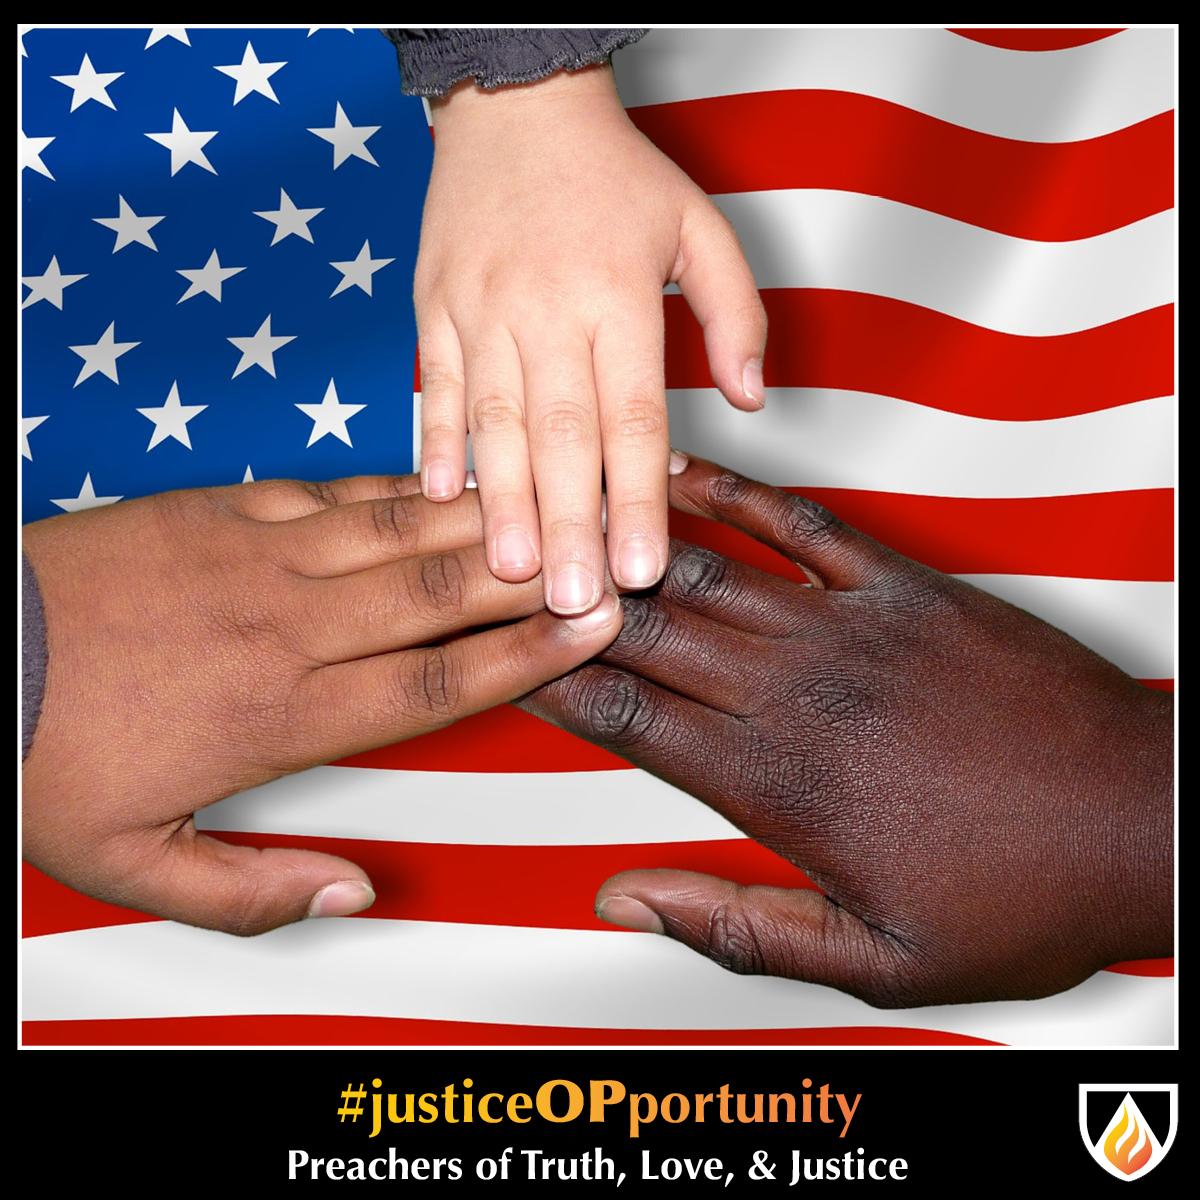 #justiceOPportunity Thursday—October 29, 2020